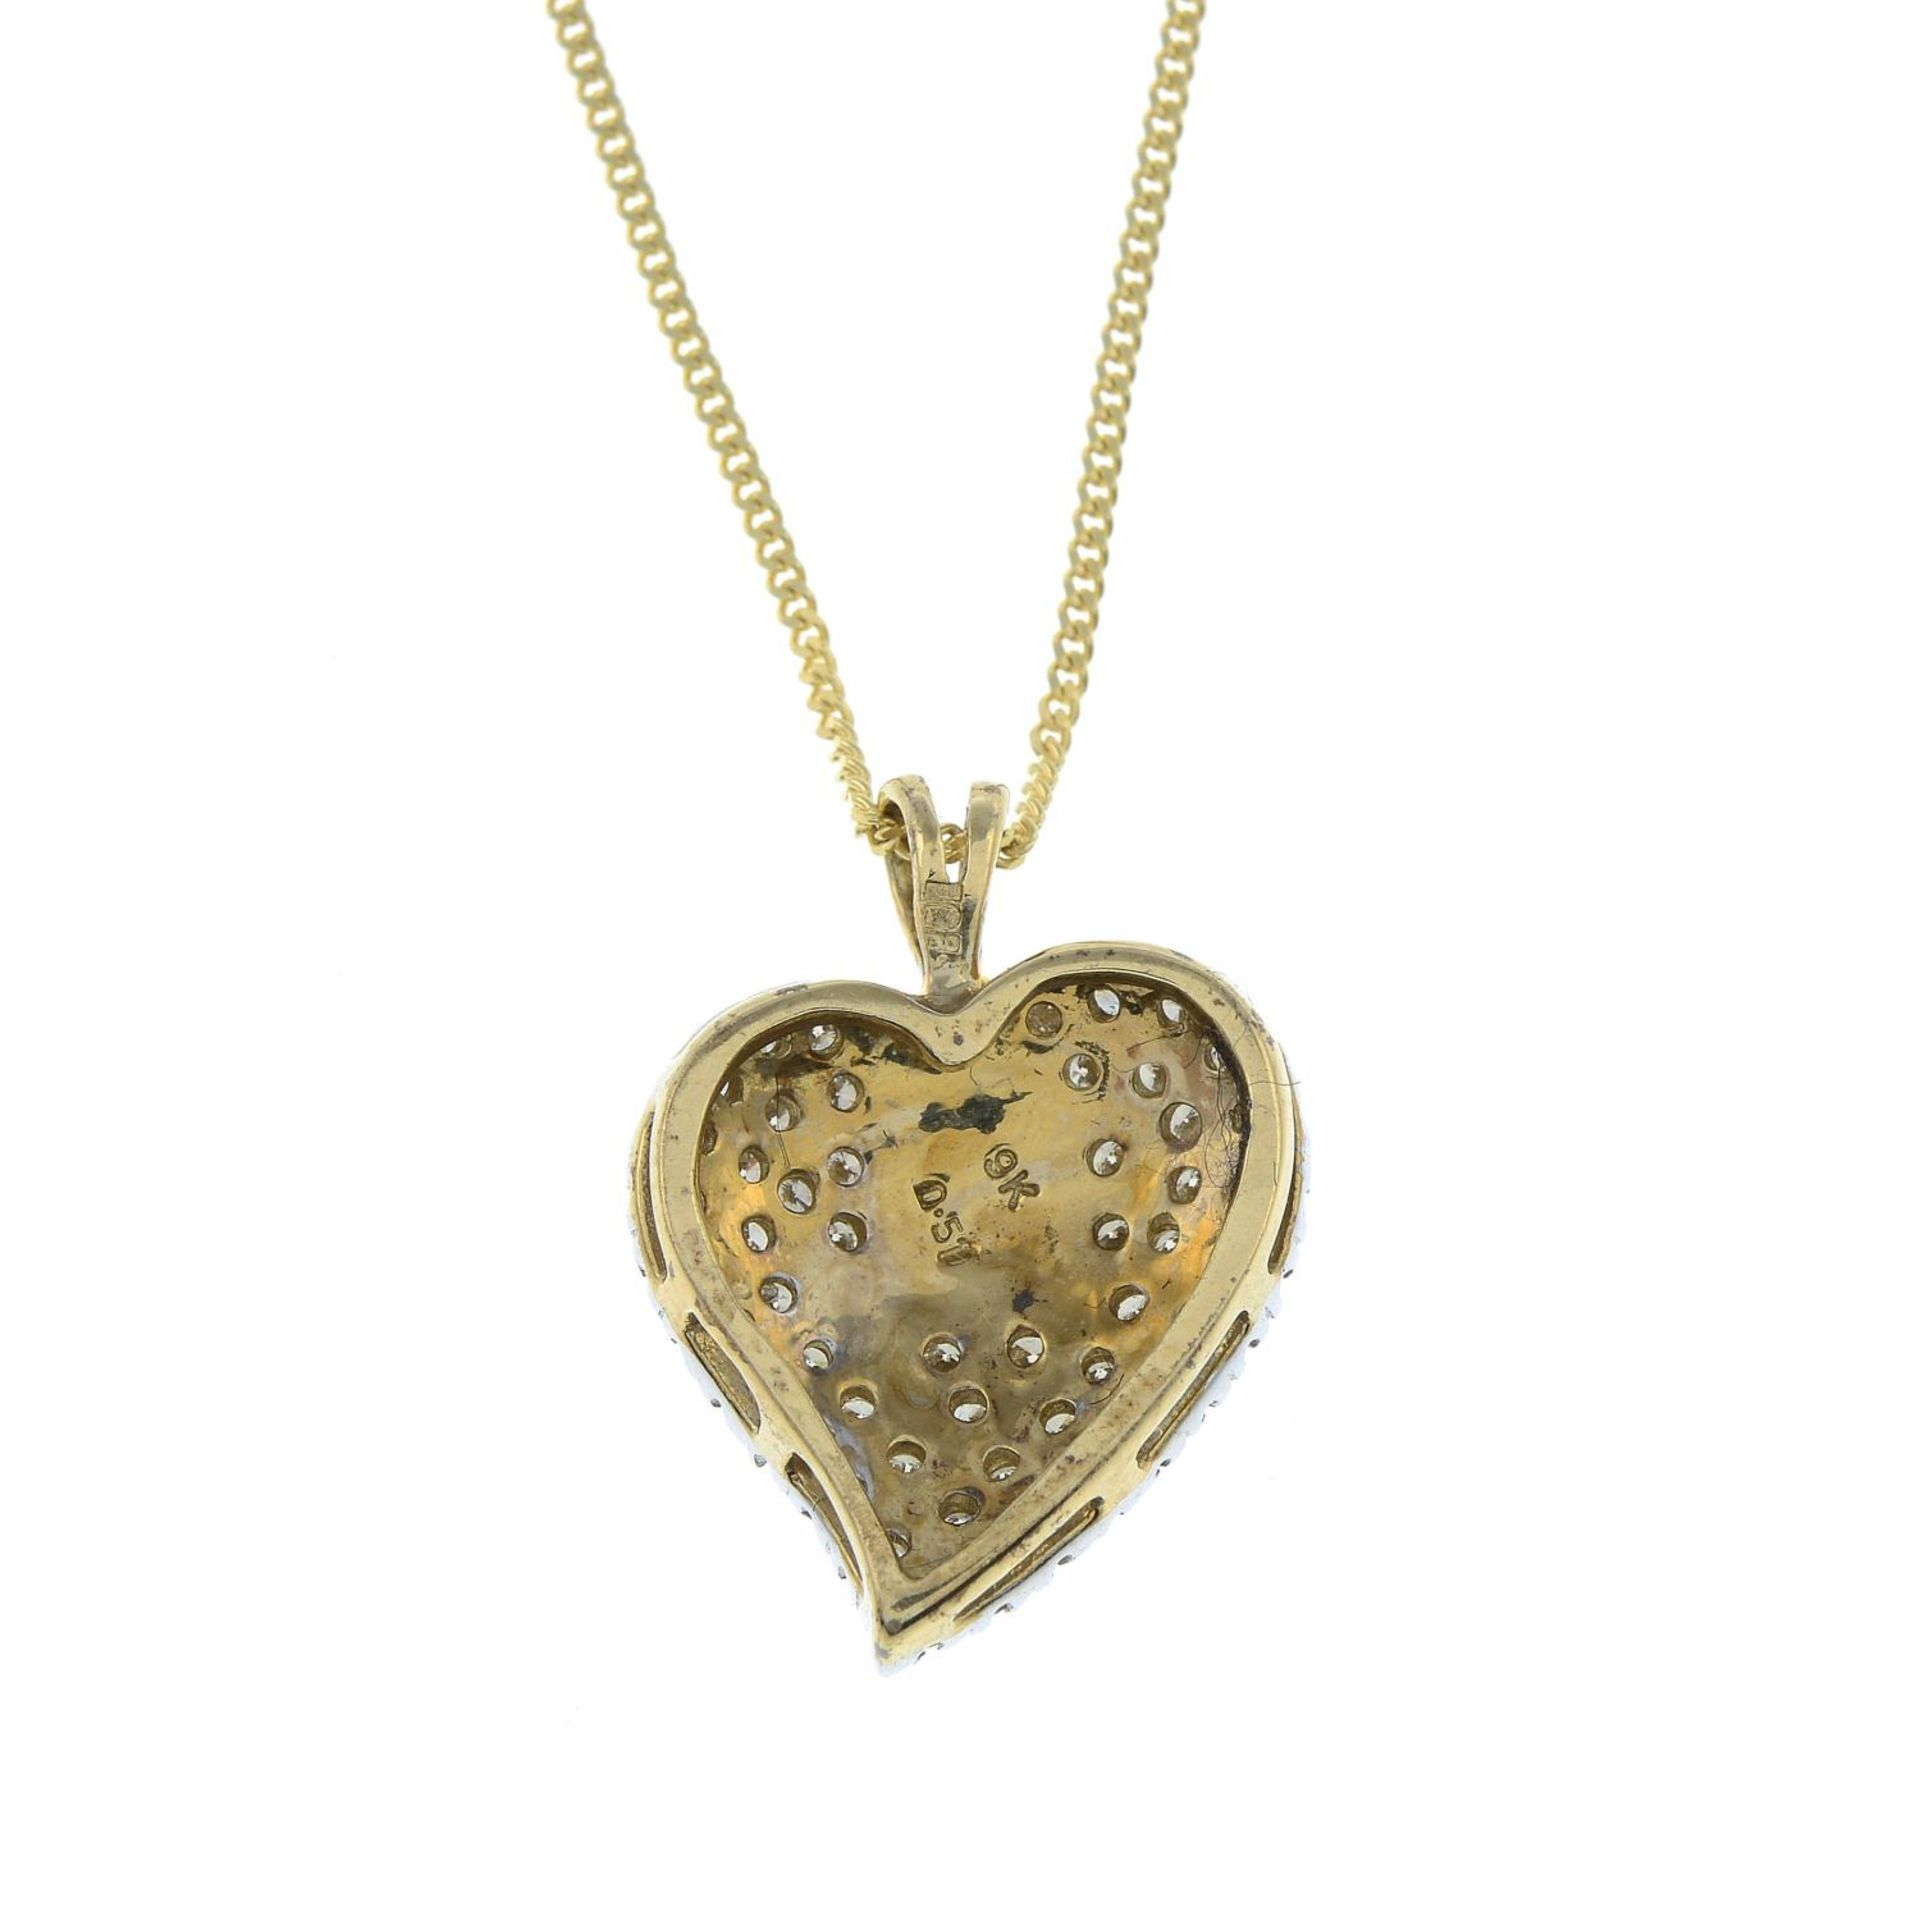 A 9ct gold brilliant-cut diamond heart pendant, with 9ct gold chain. - Bild 2 aus 2